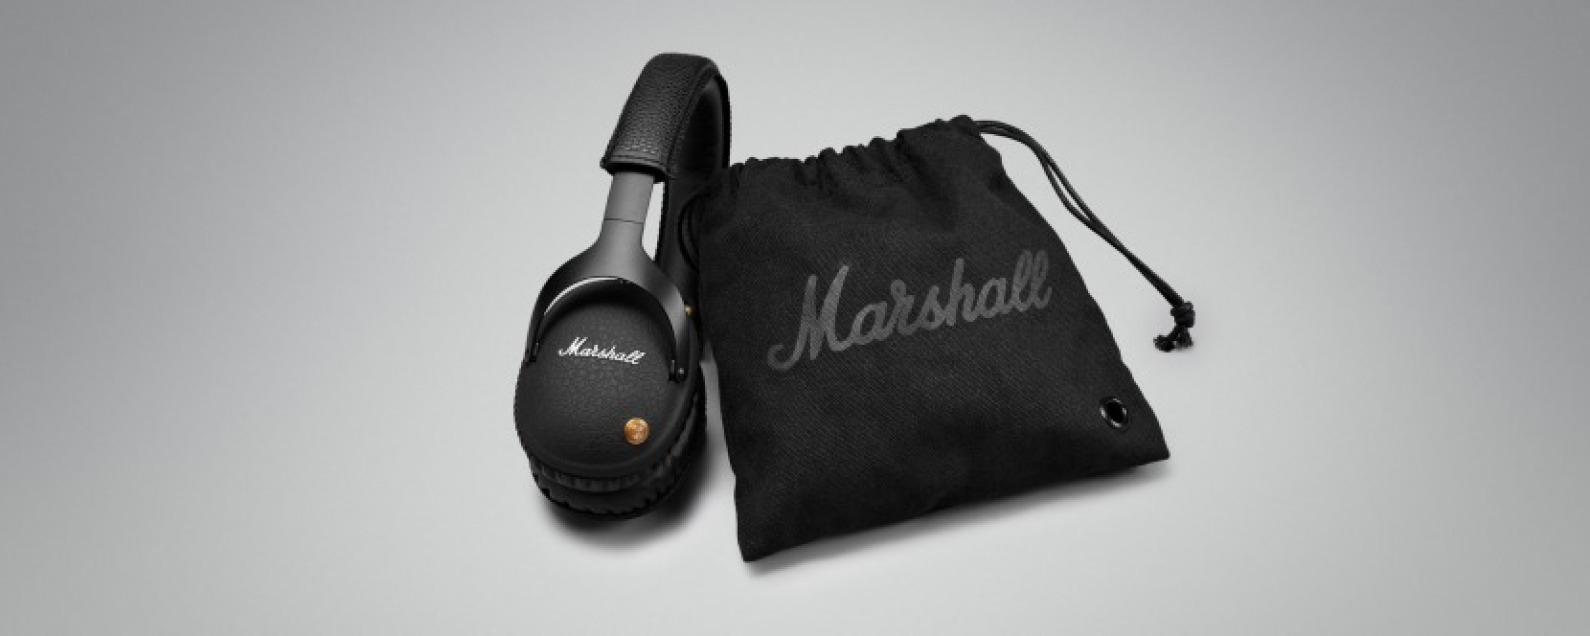 Marshall Monitor Bluetooth Headphones Review | iPhoneLife com